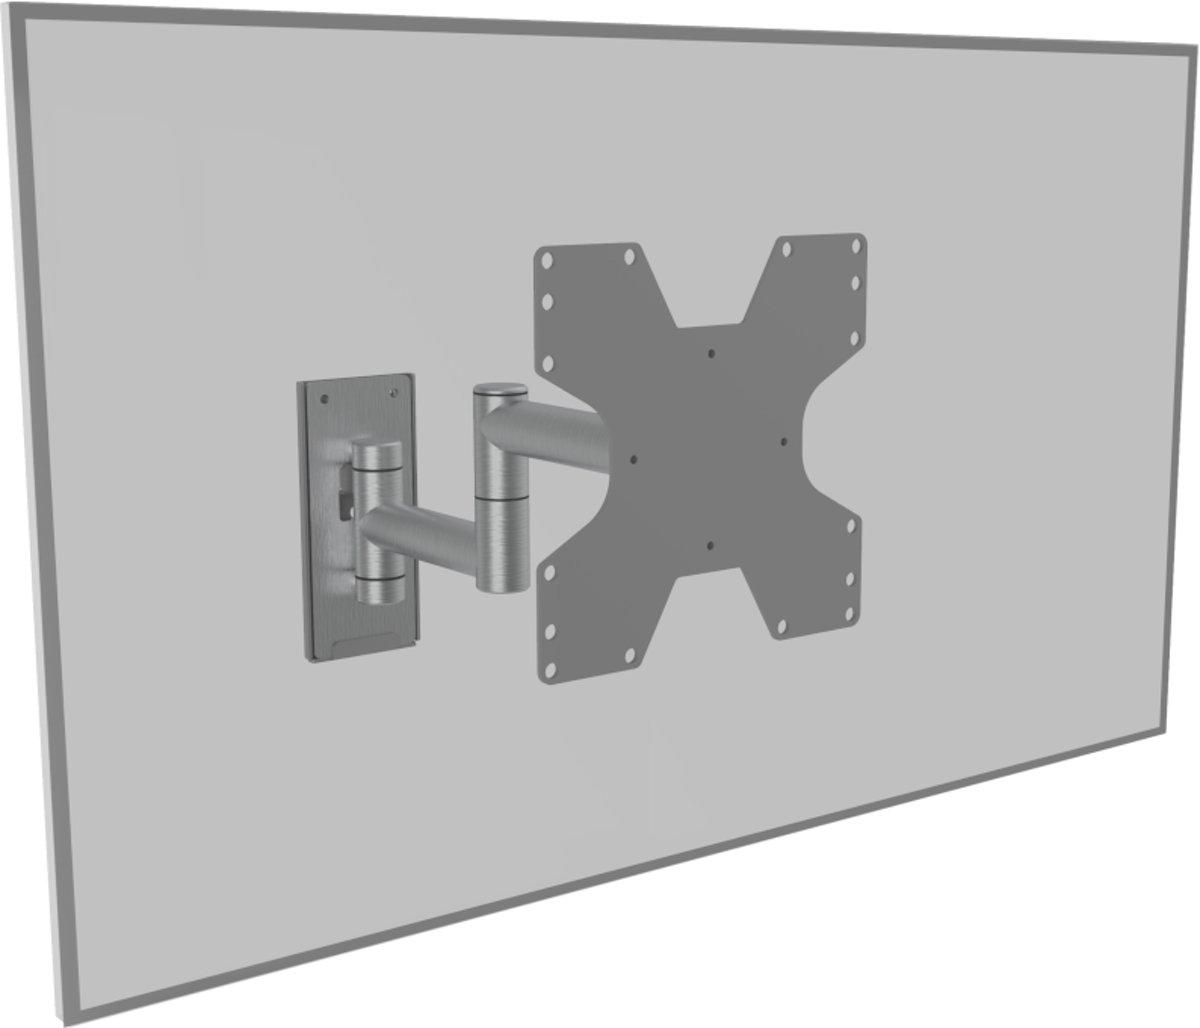 Cavus WMV2001 TV Muurbeugel - Premium Full motion ophangbeugel voor 23 - 42 Inch  max 30kg - Universele VESA muursteun Aluminium kopen